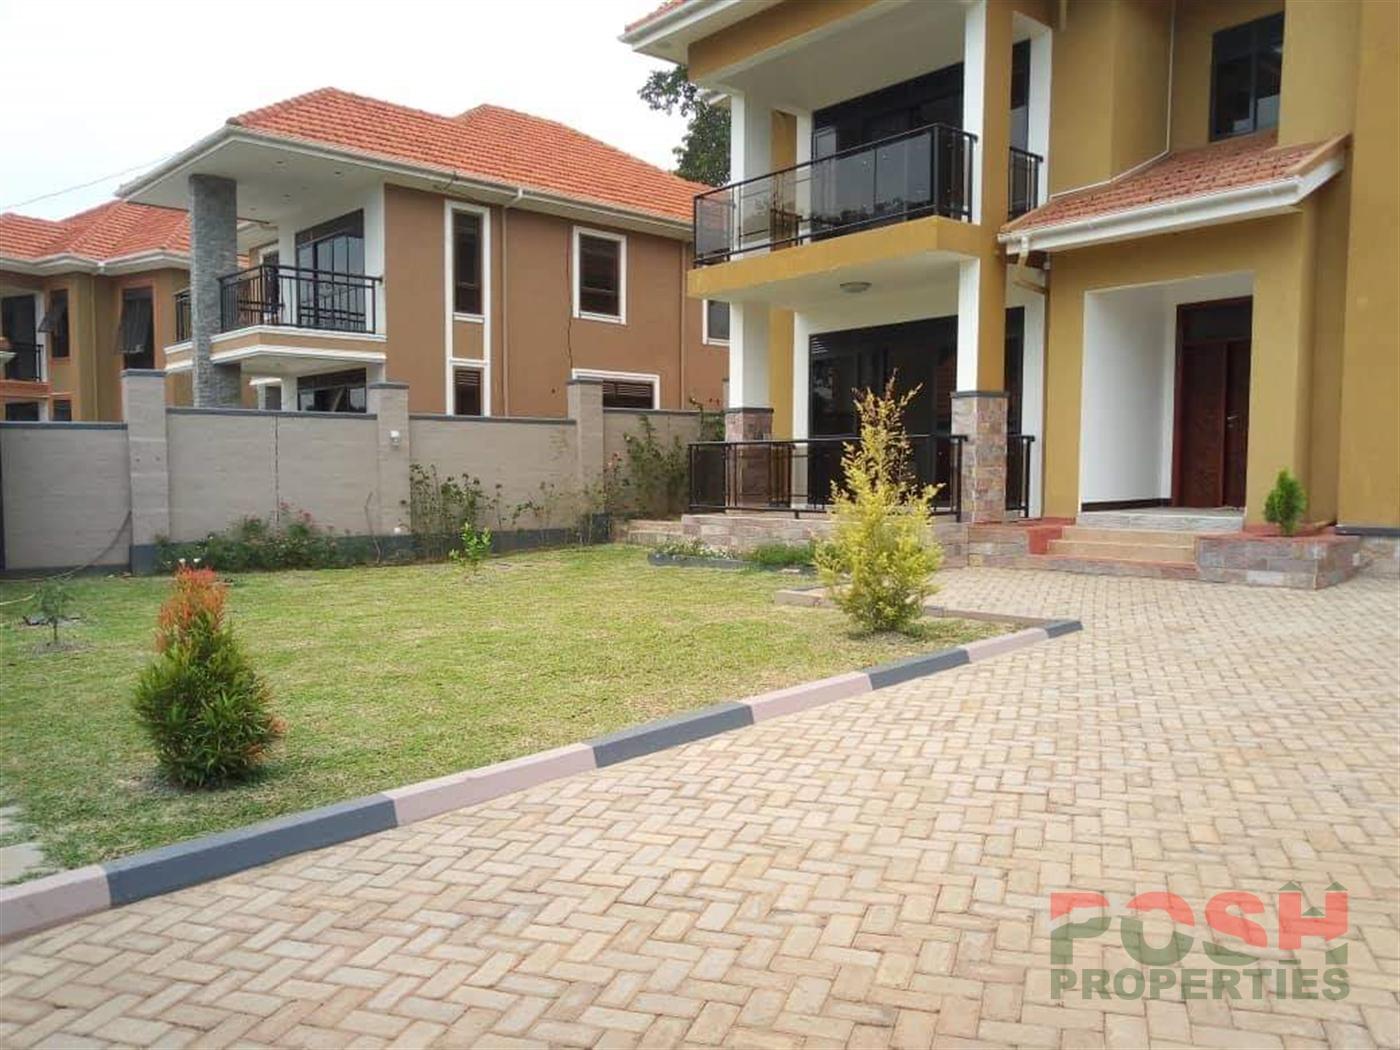 Mansion for sale in Bbunga Wakiso